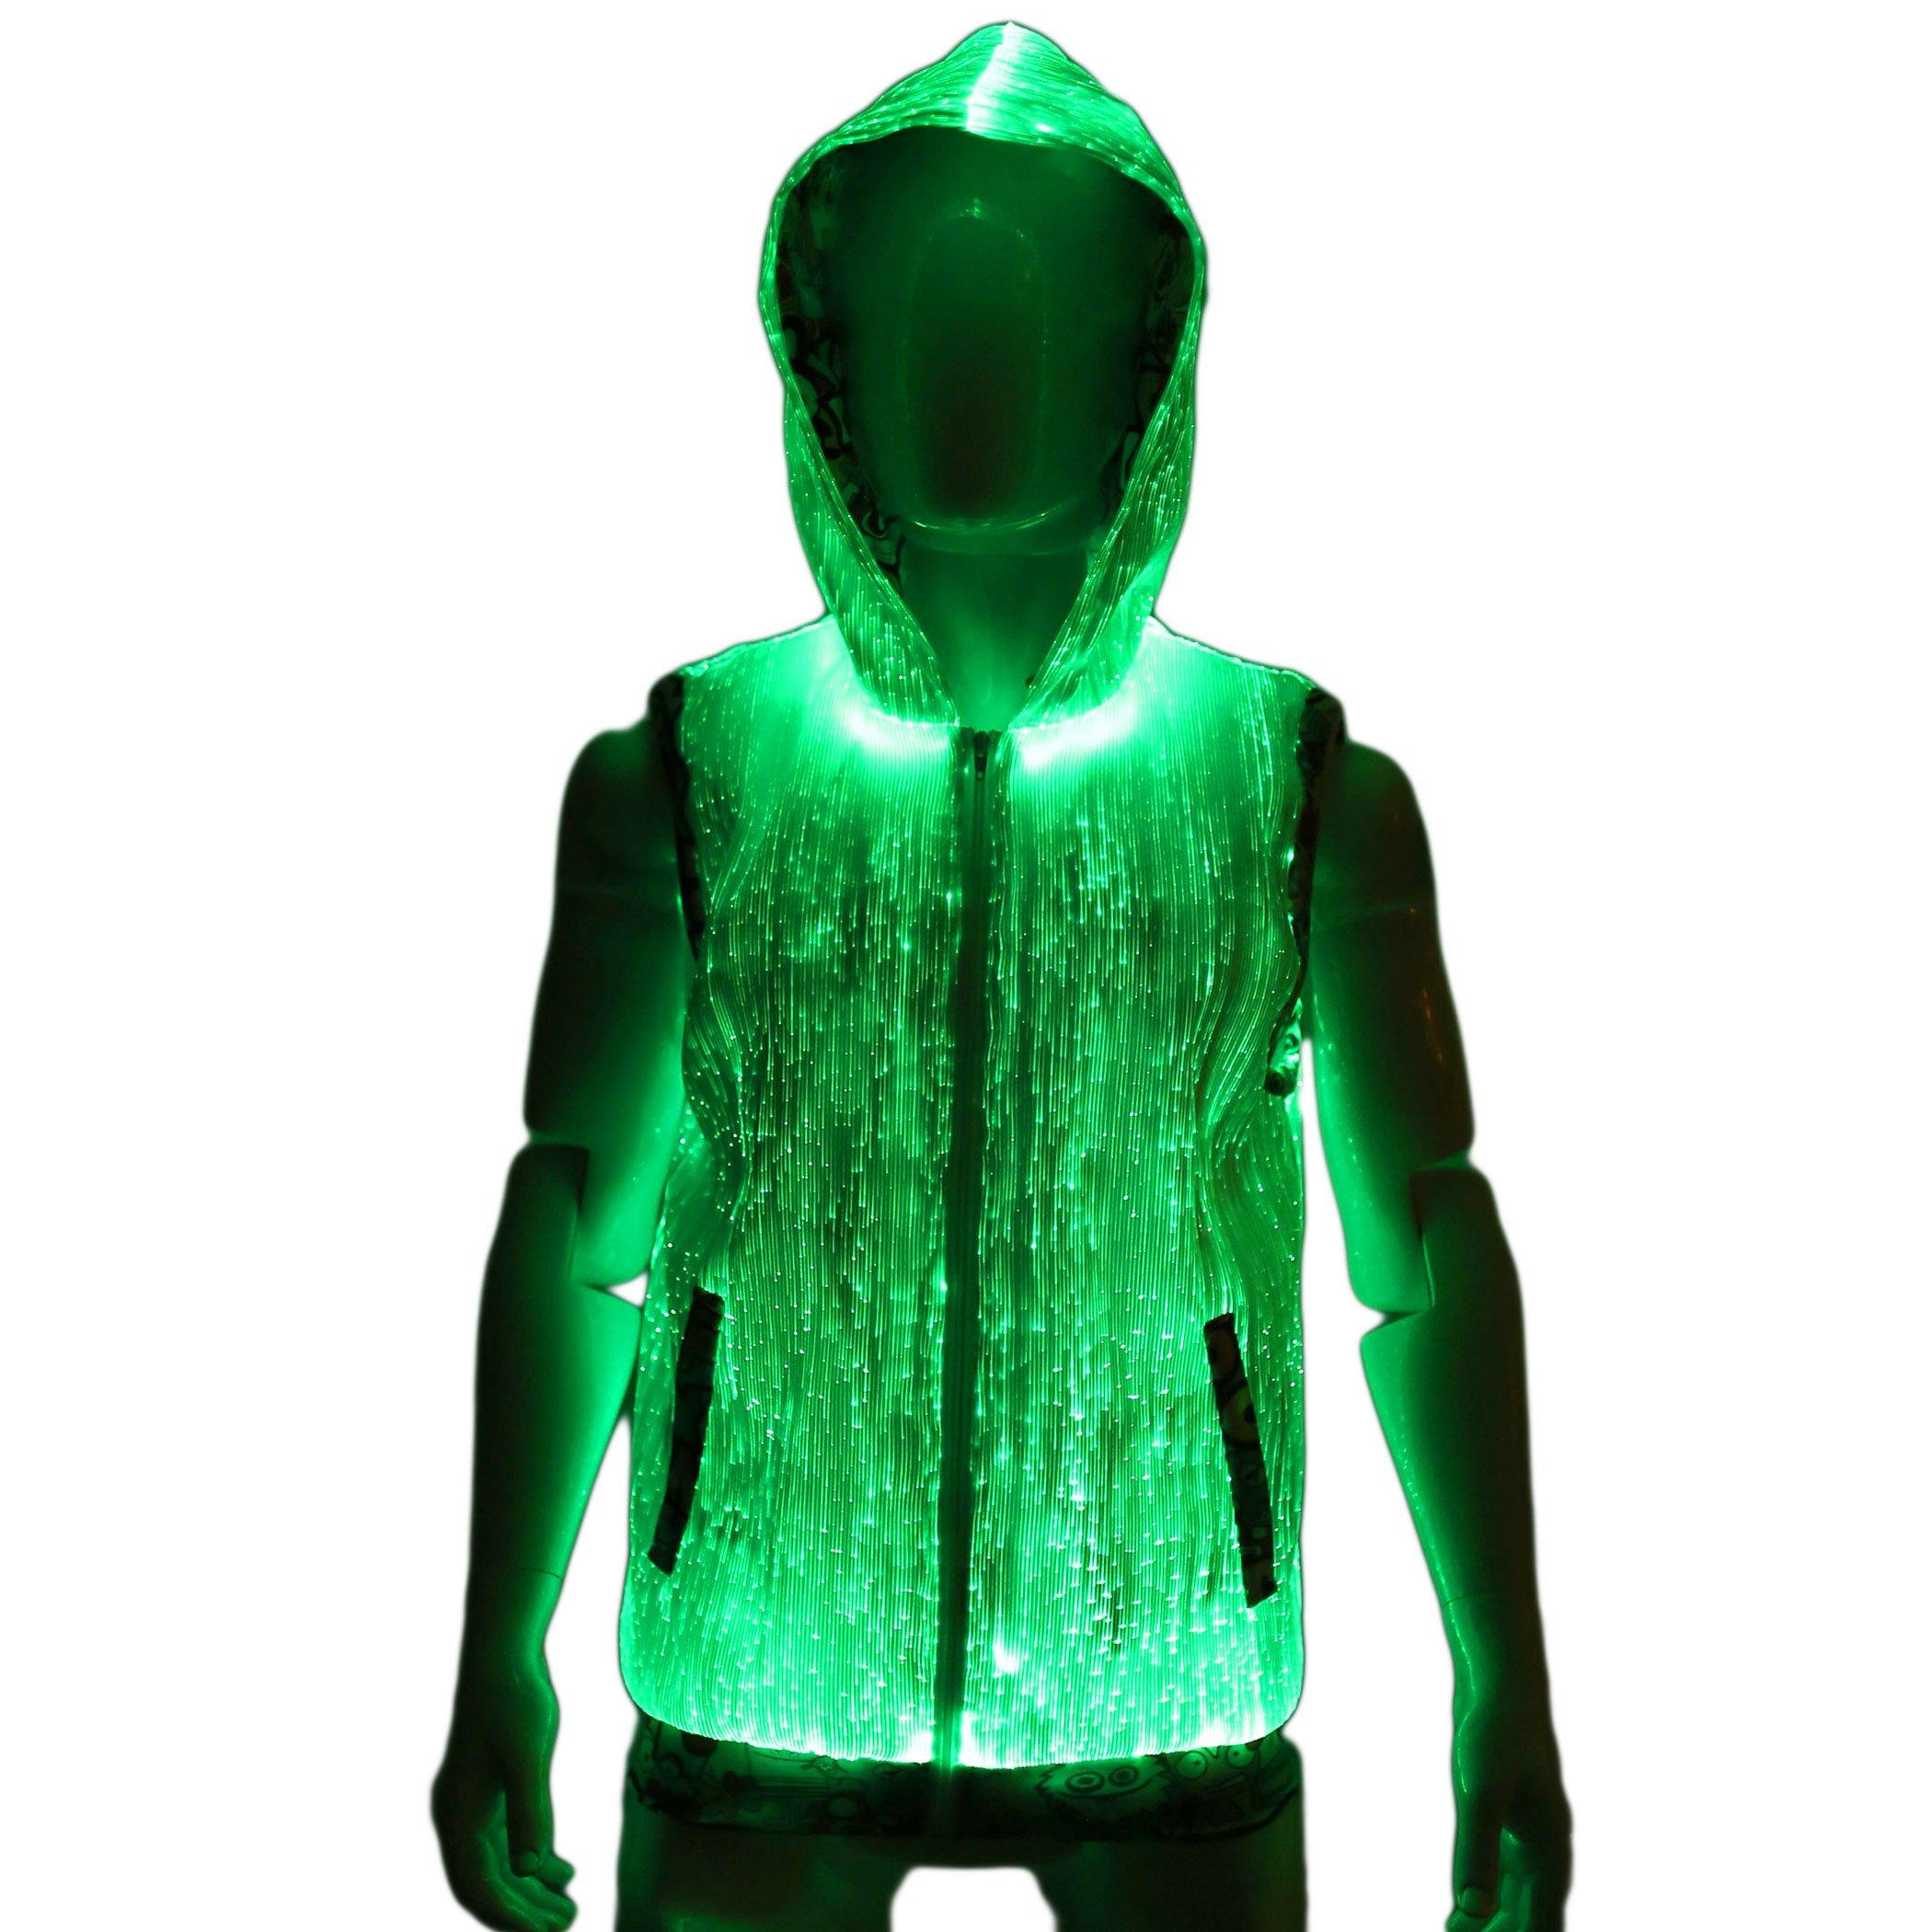 Burning Man Clothing Cool Hoodies for Guys Rave Costumes for Guys Mens Rave Wear Cool Hoodies for Guys GXSE9